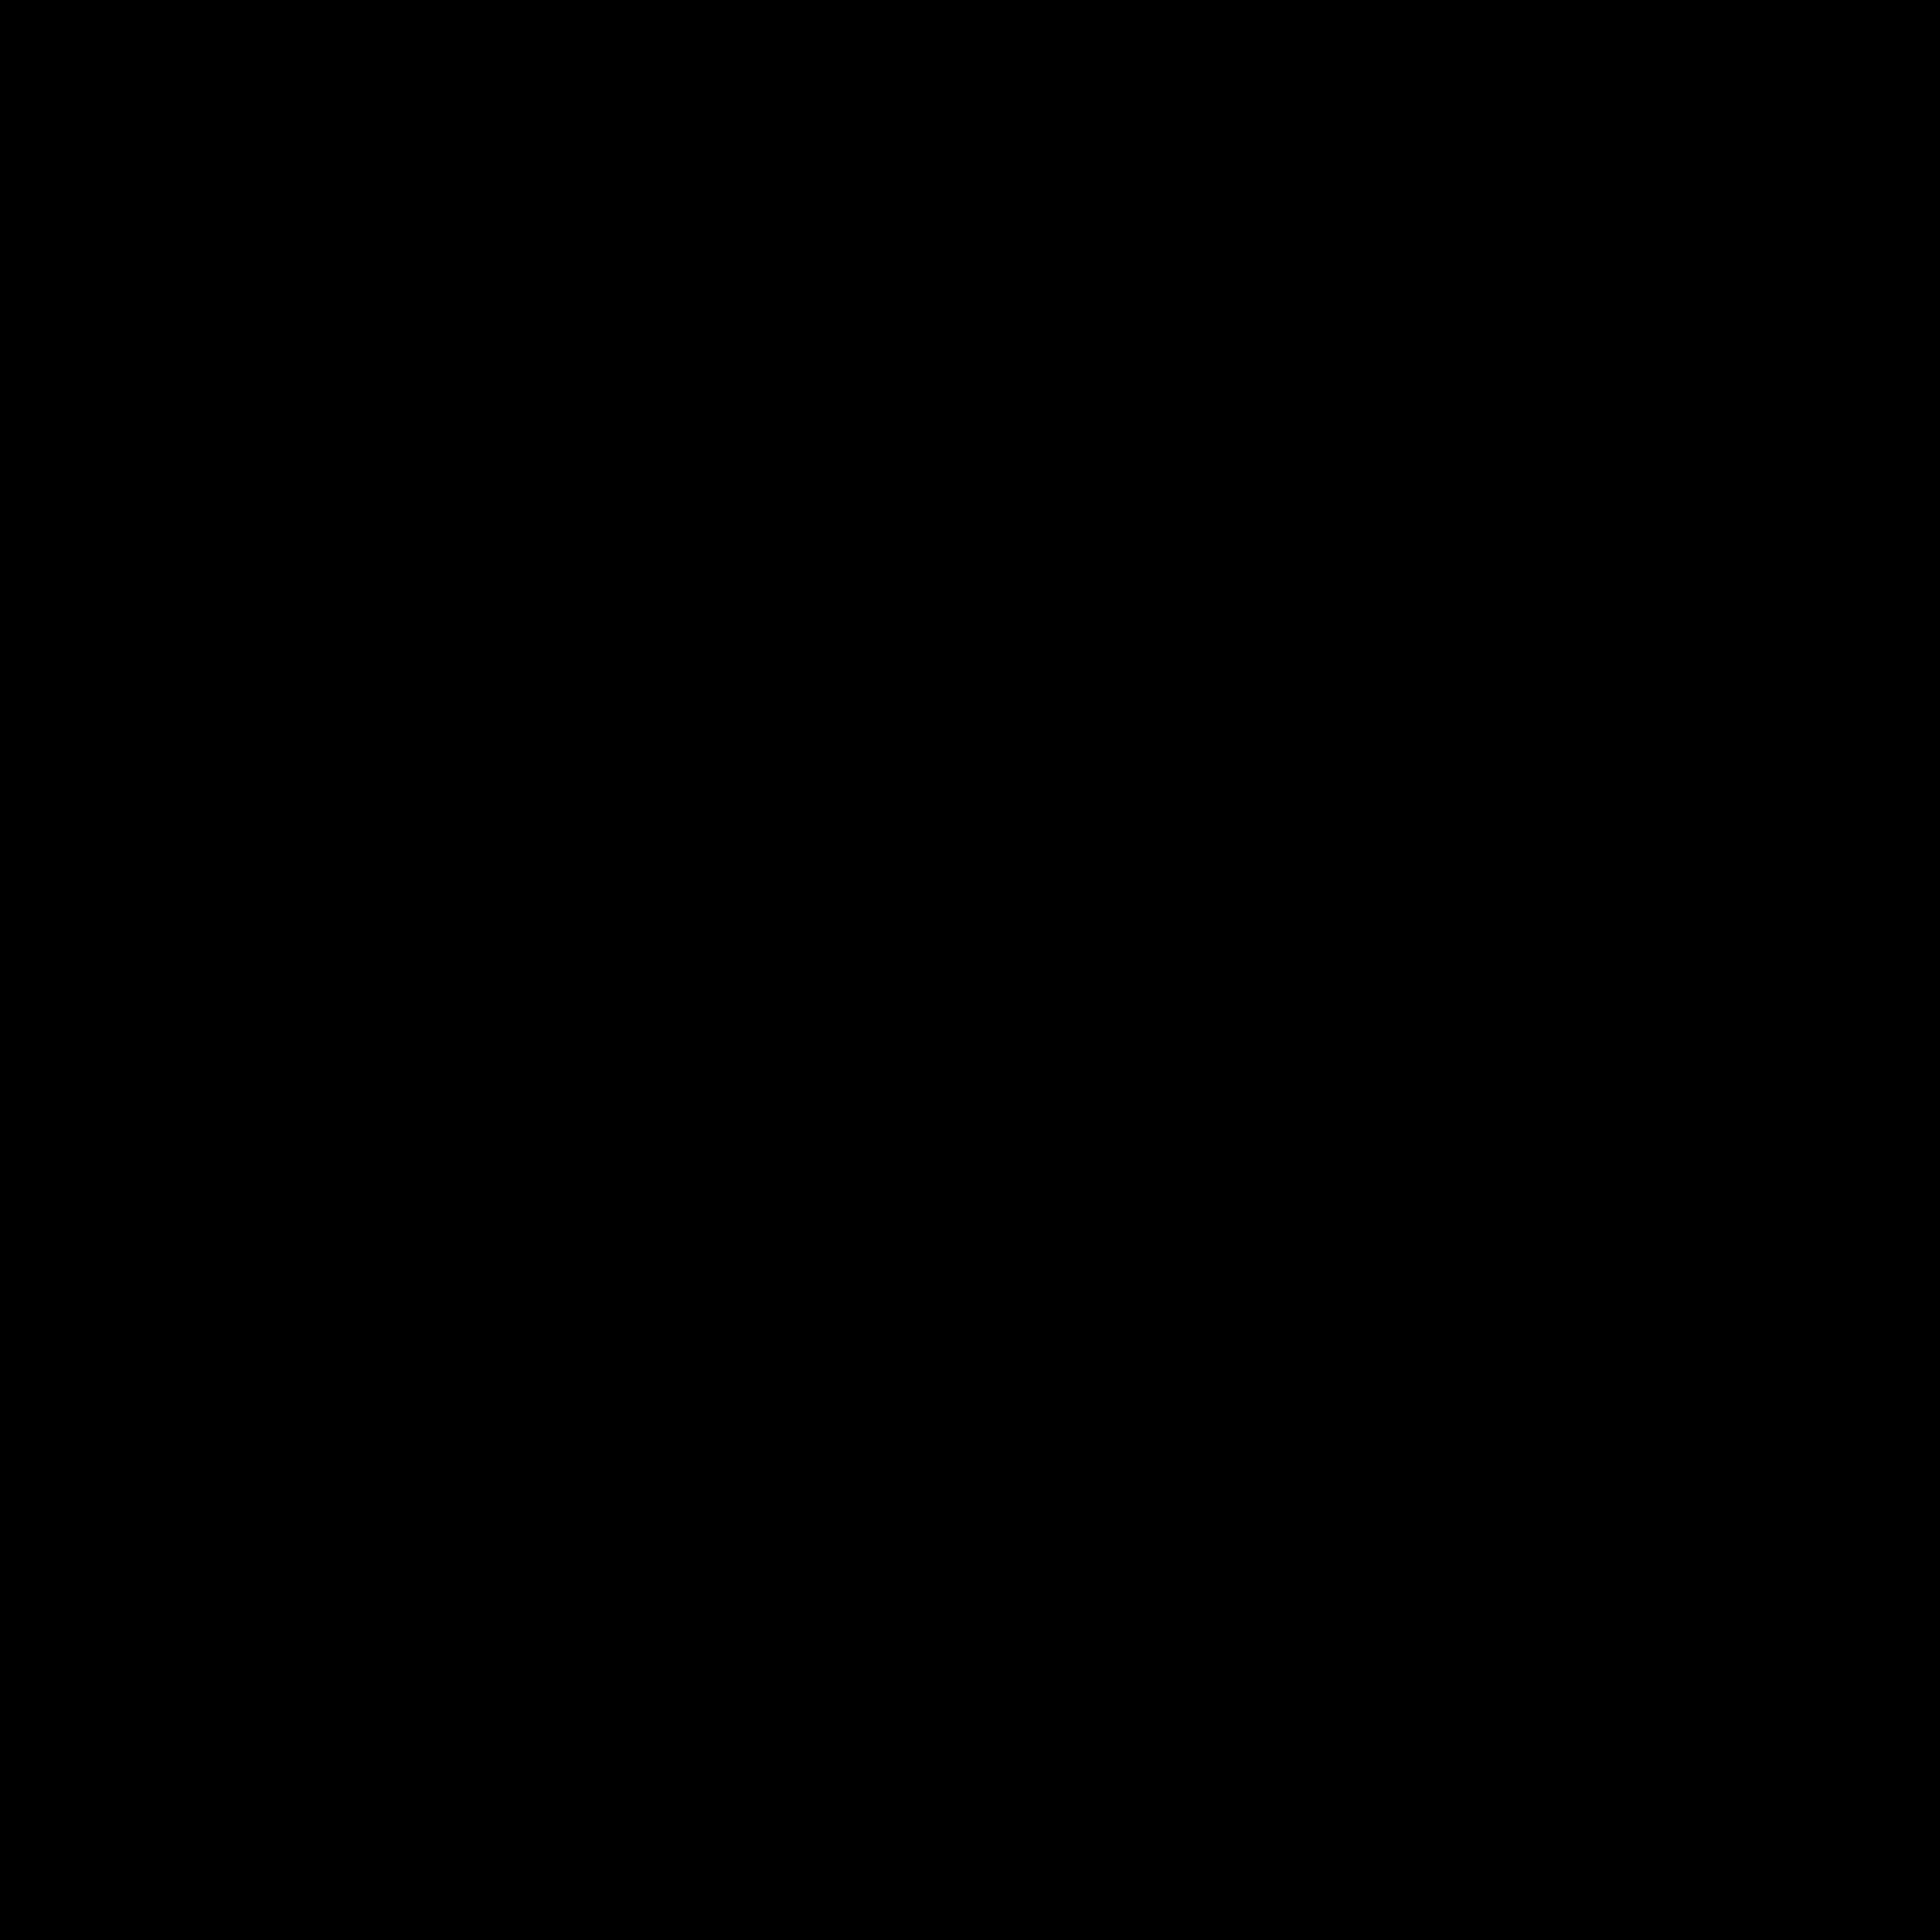 Gucci логотип PNG